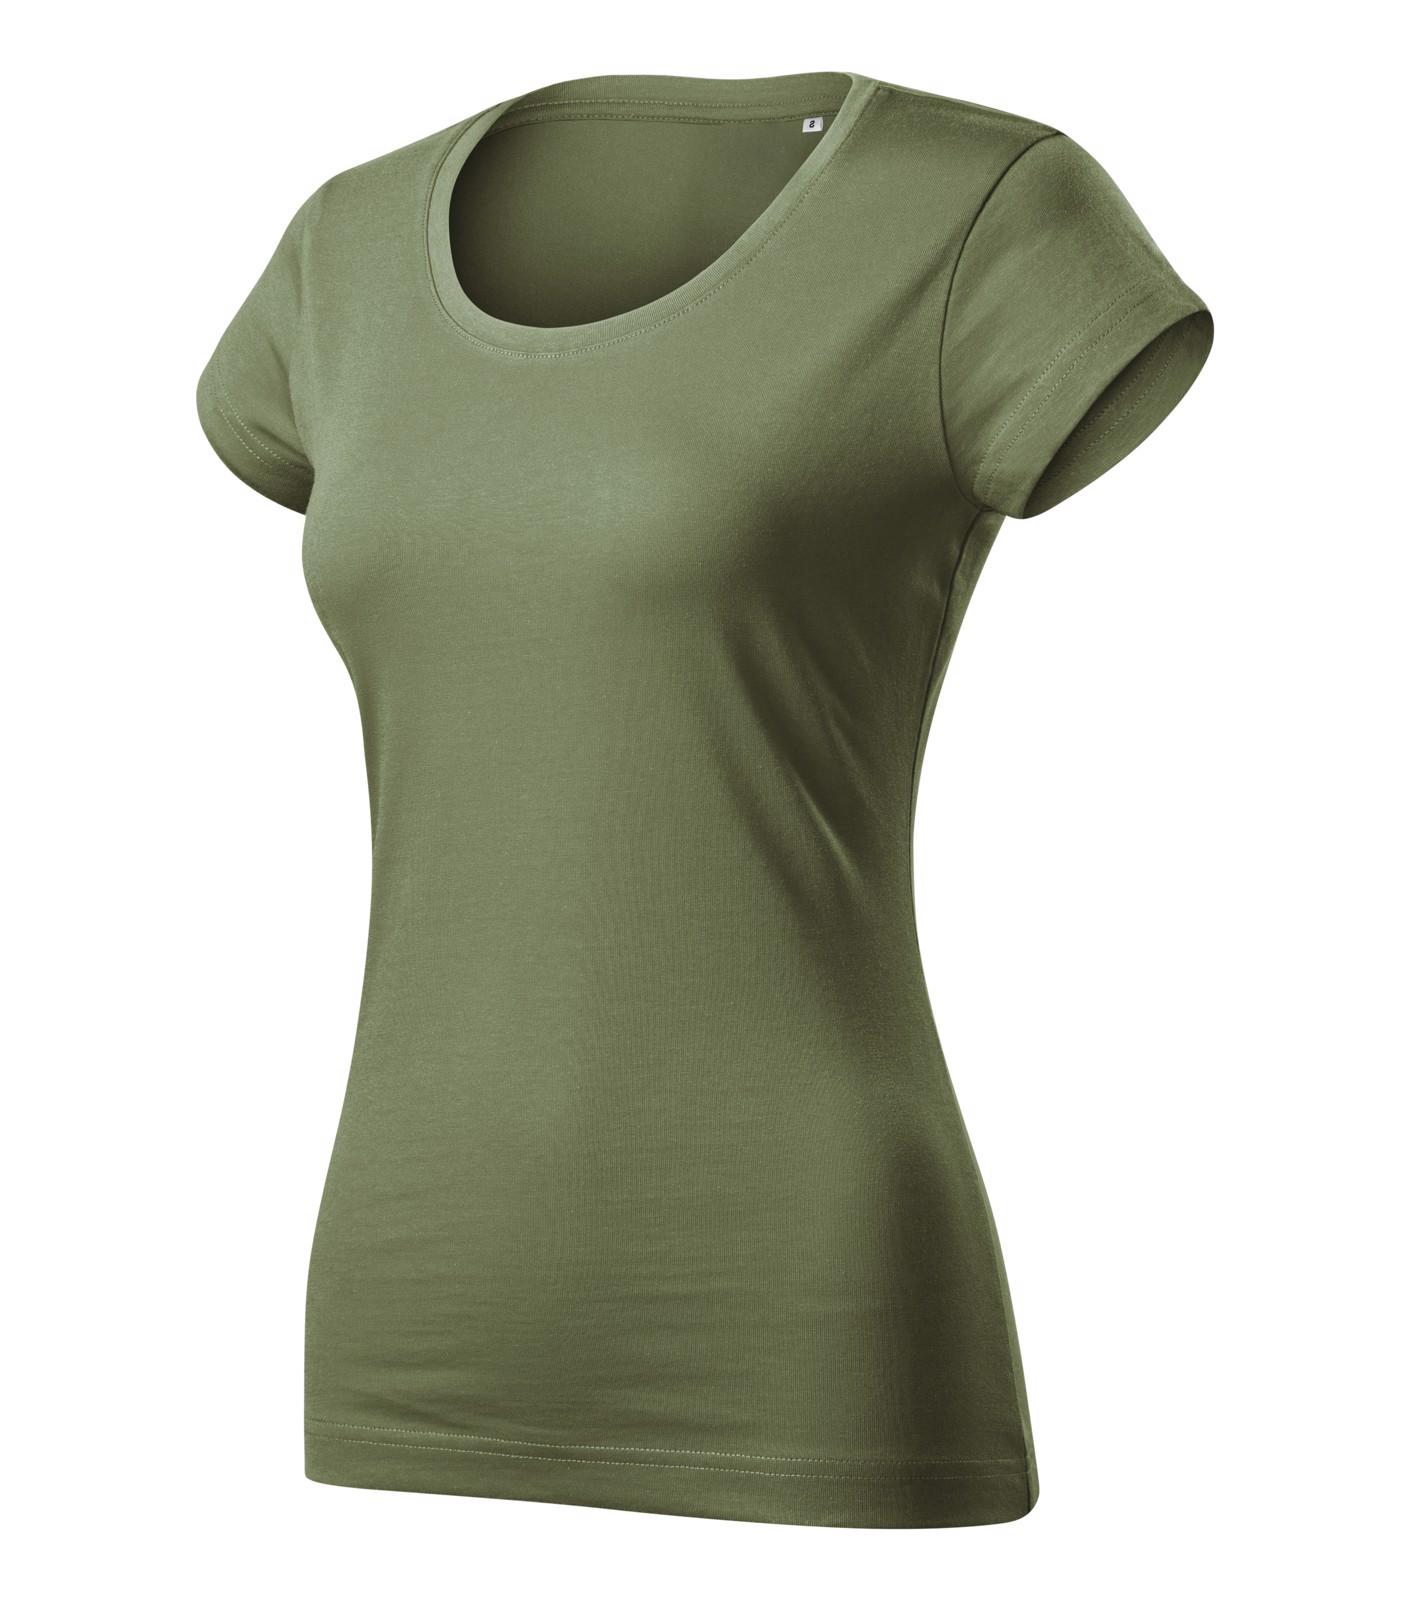 Tričko dámské Malfini Viper Free - Khaki / XL